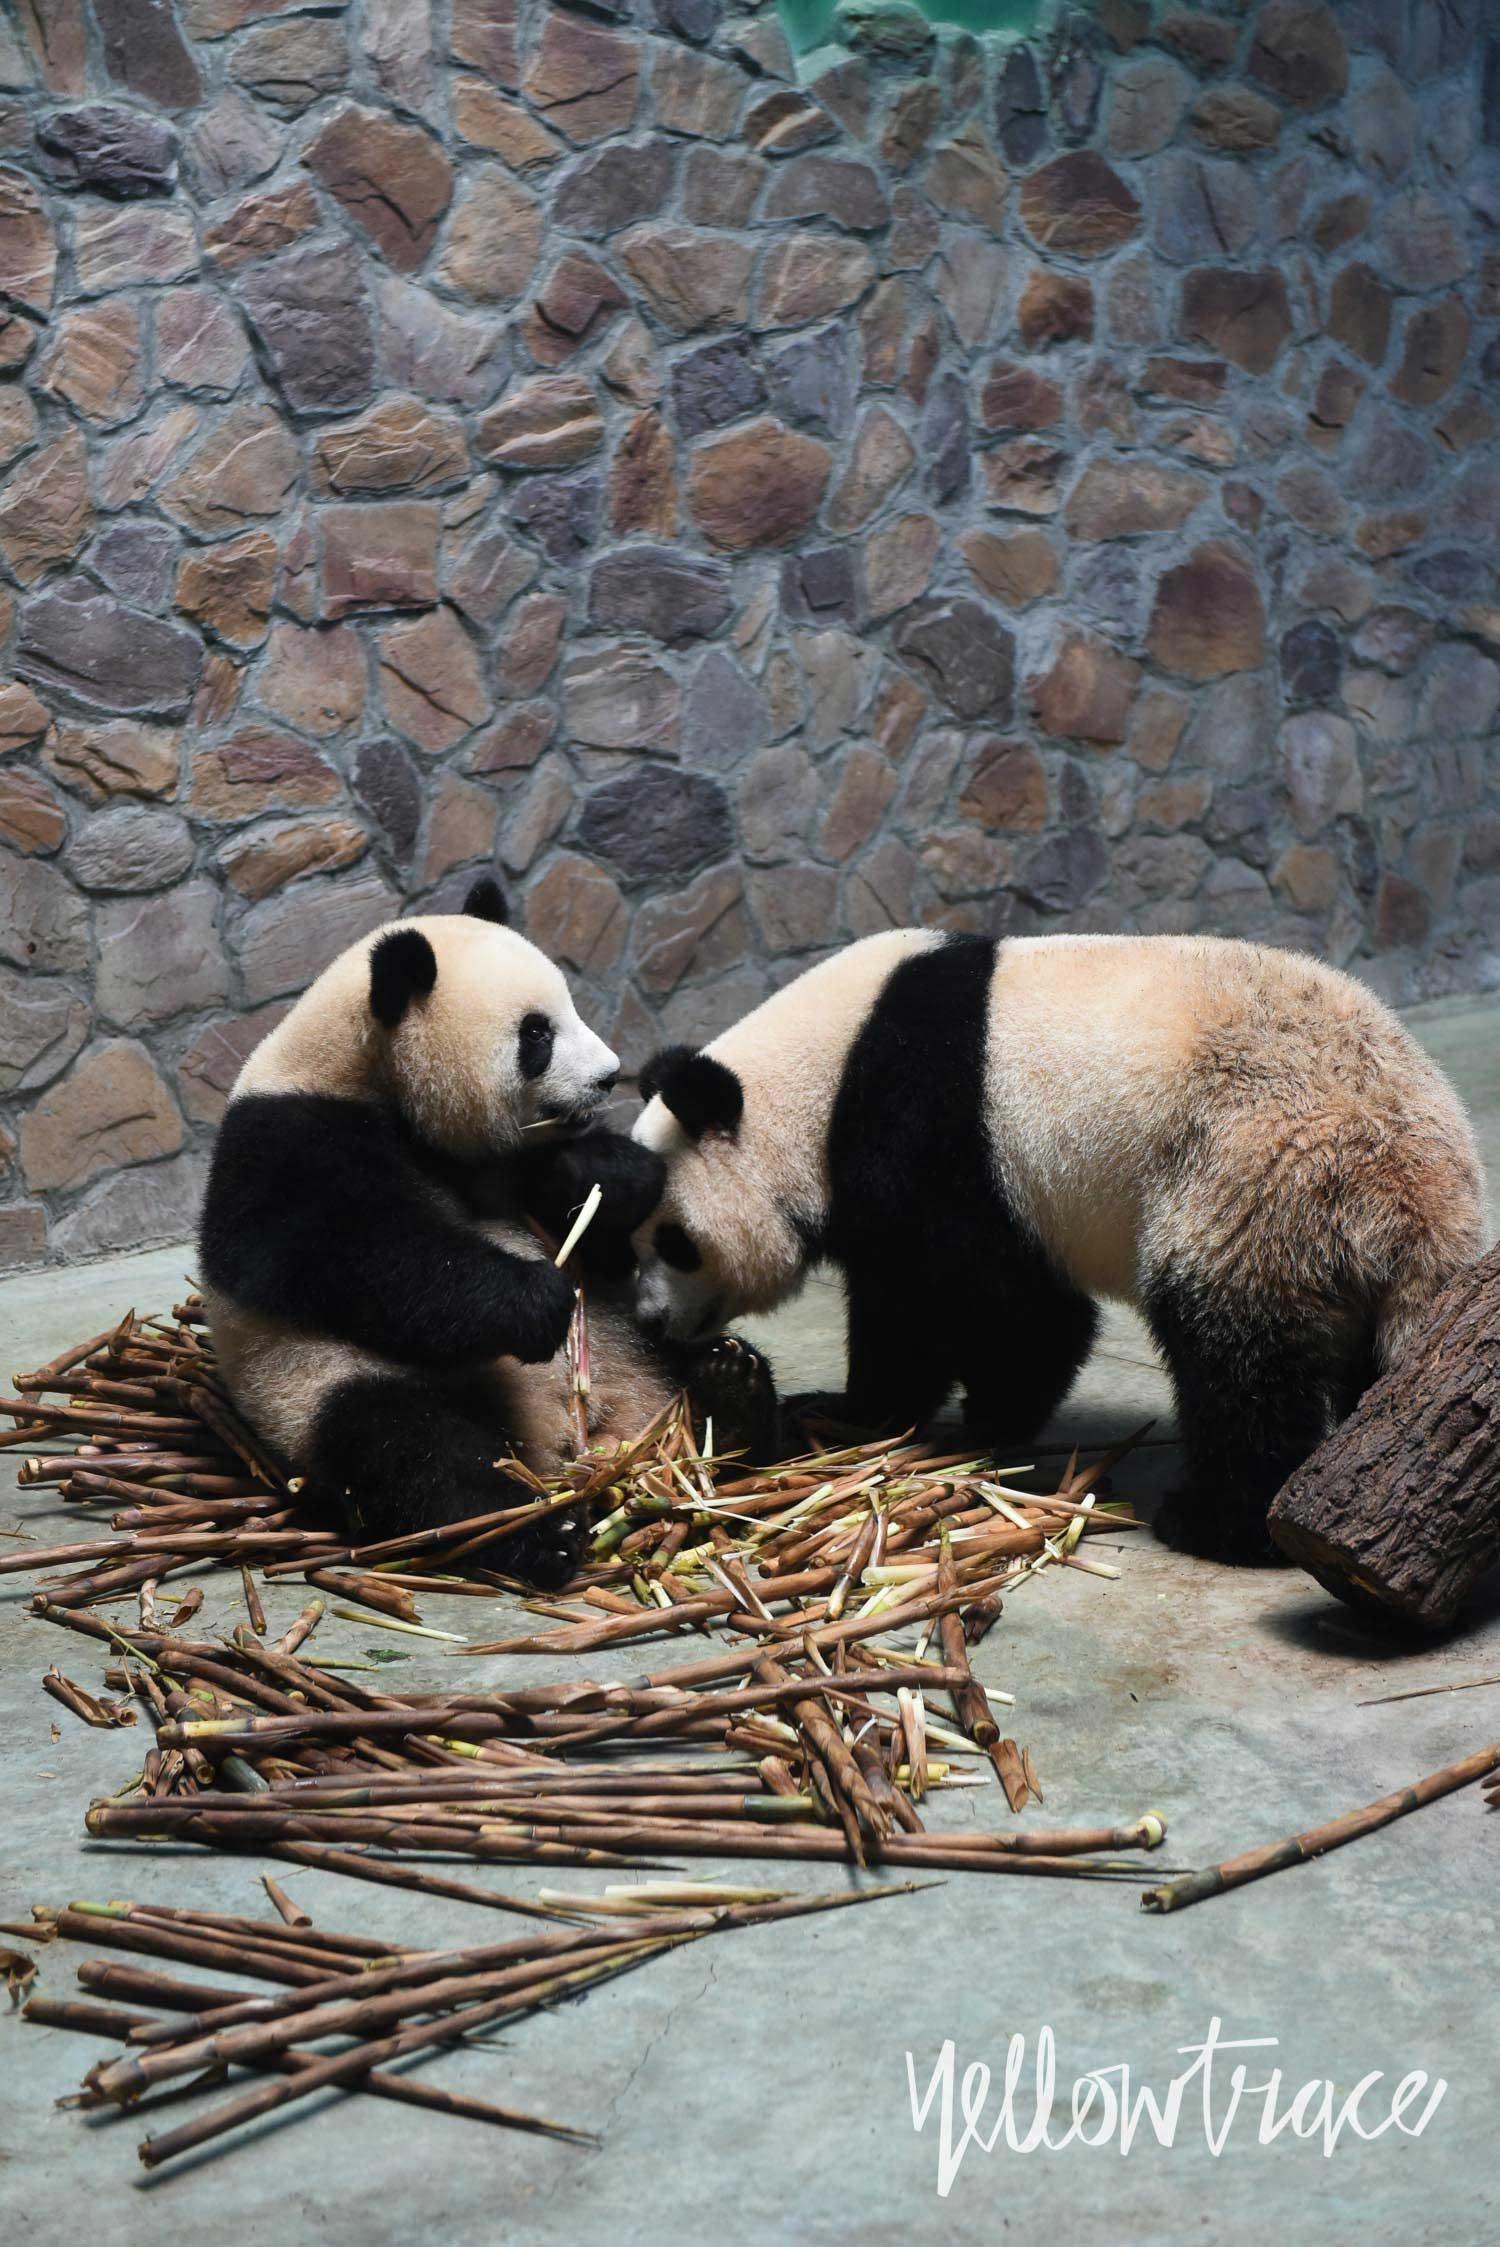 Chengdu Research Base of Giant Panda Breeding, Photo © Nick Hughes | Yellowtrace